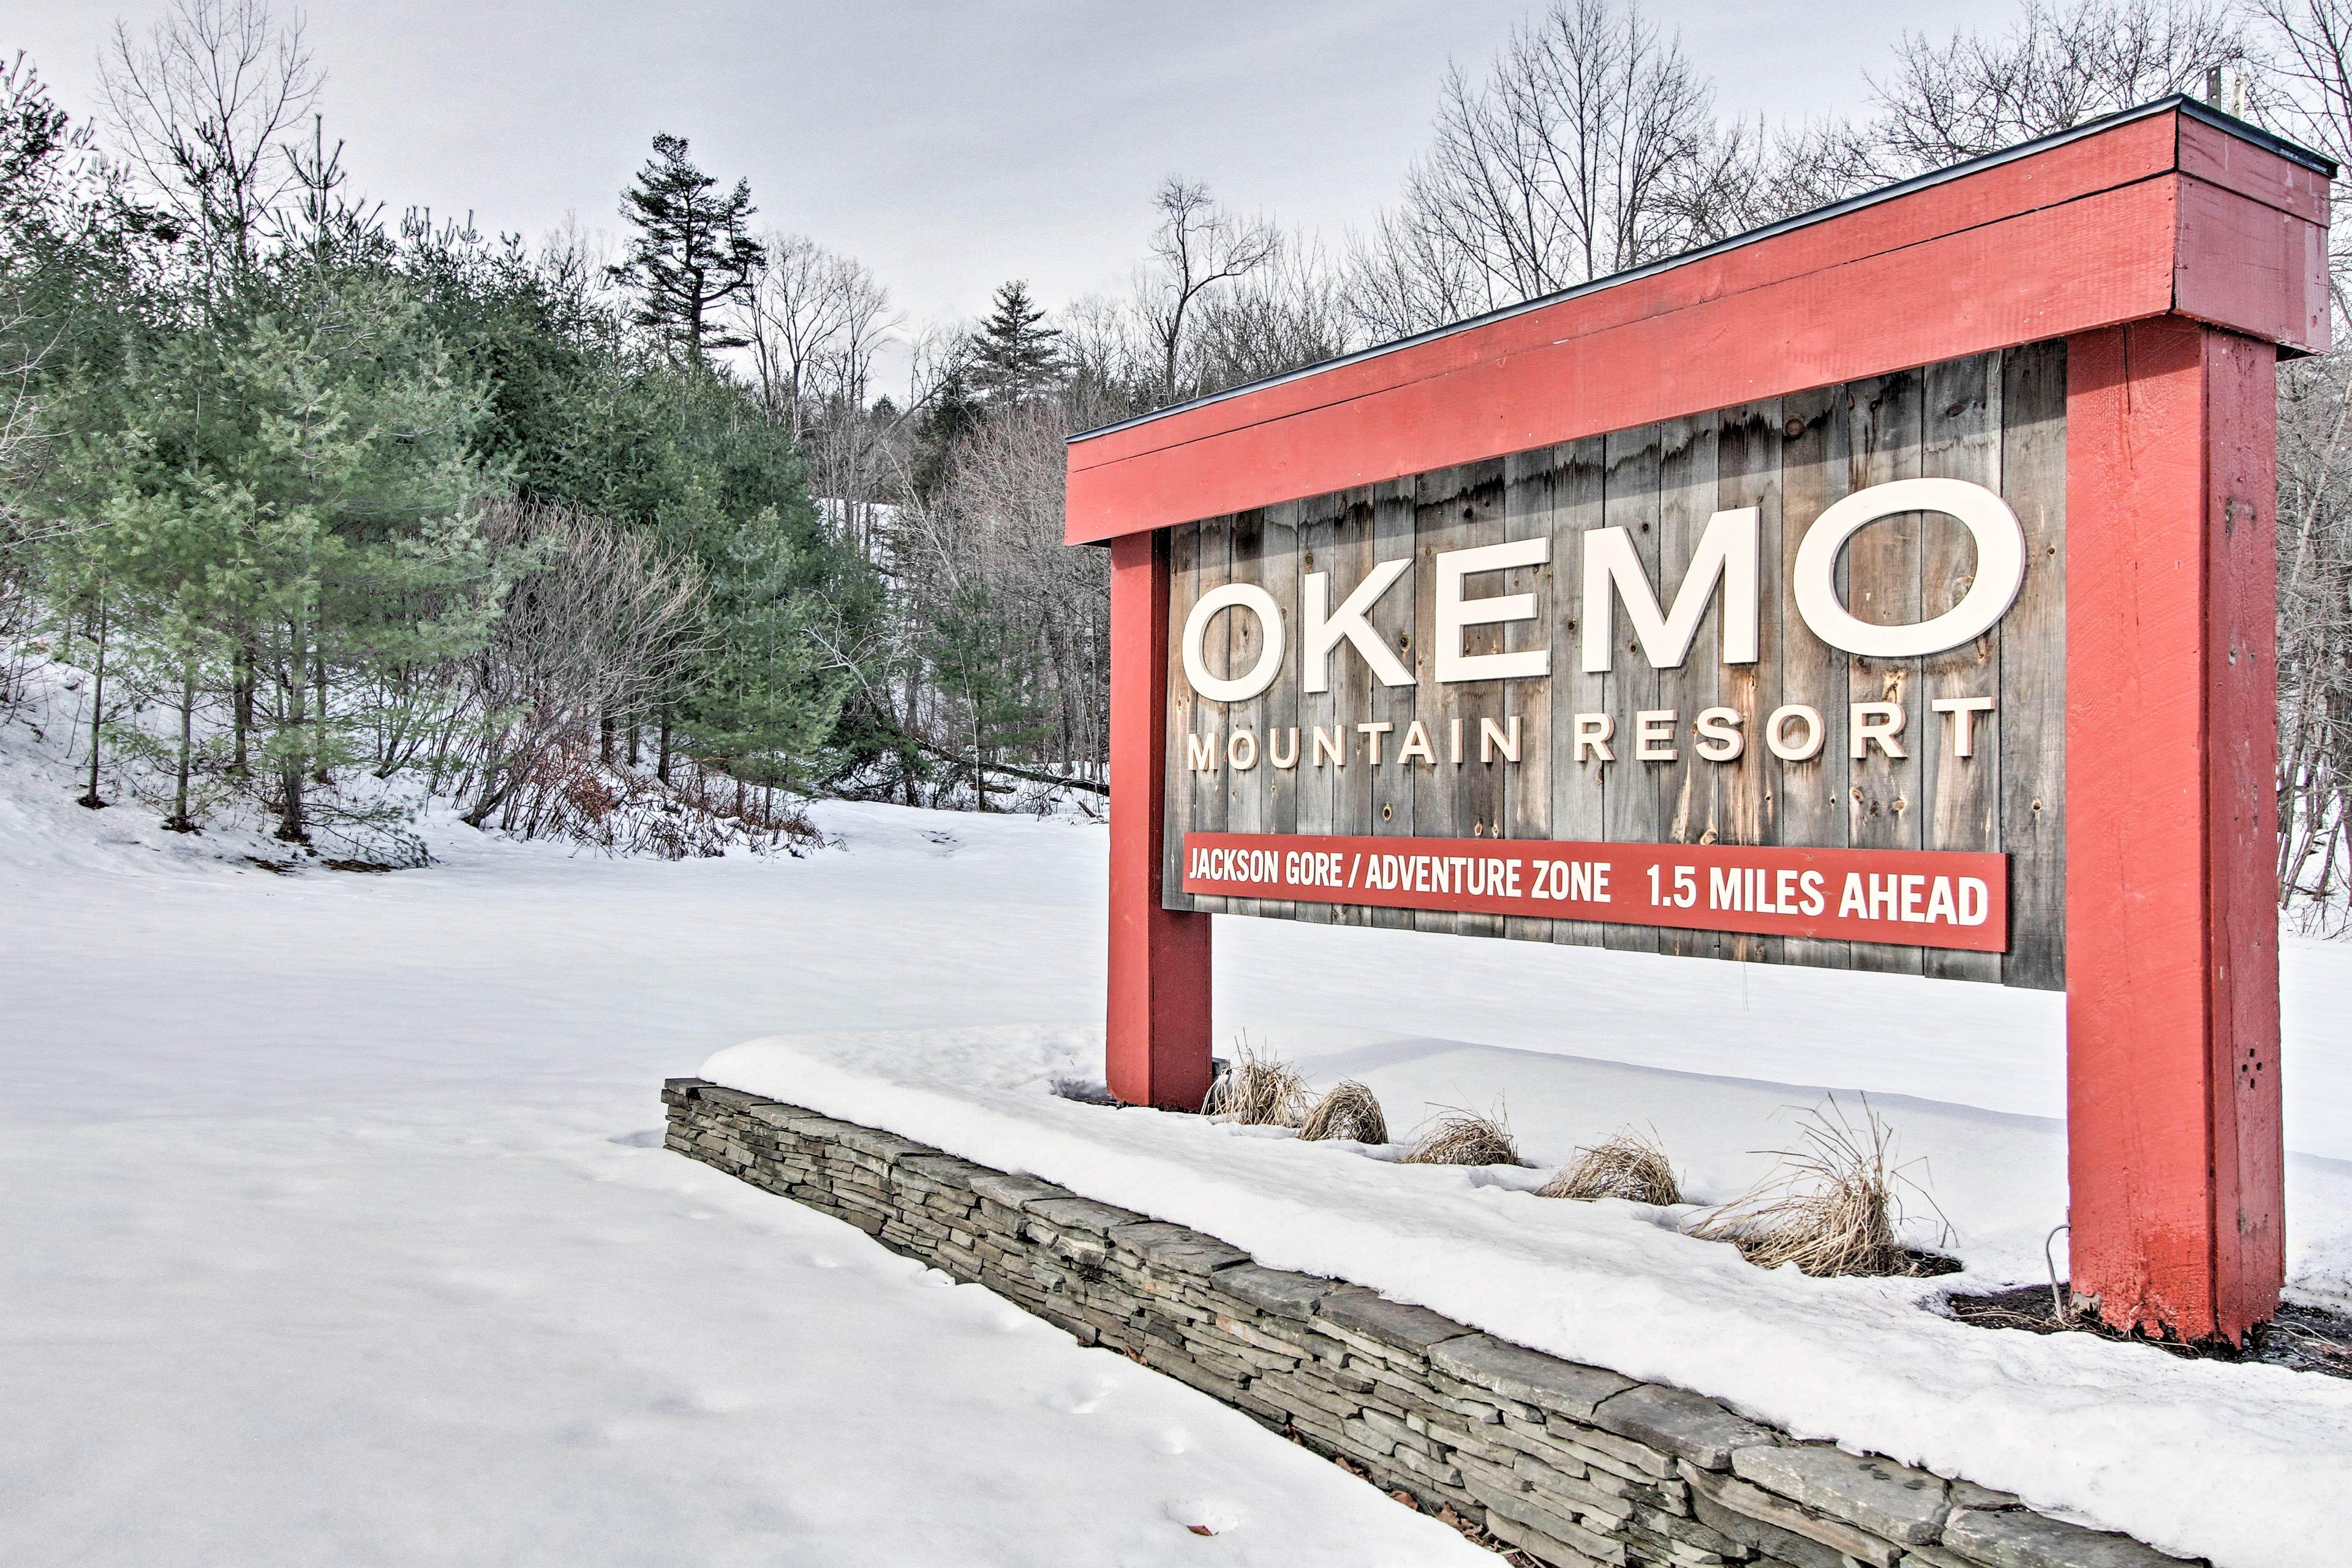 Okemo Mountain Resort is less than 3 miles away!